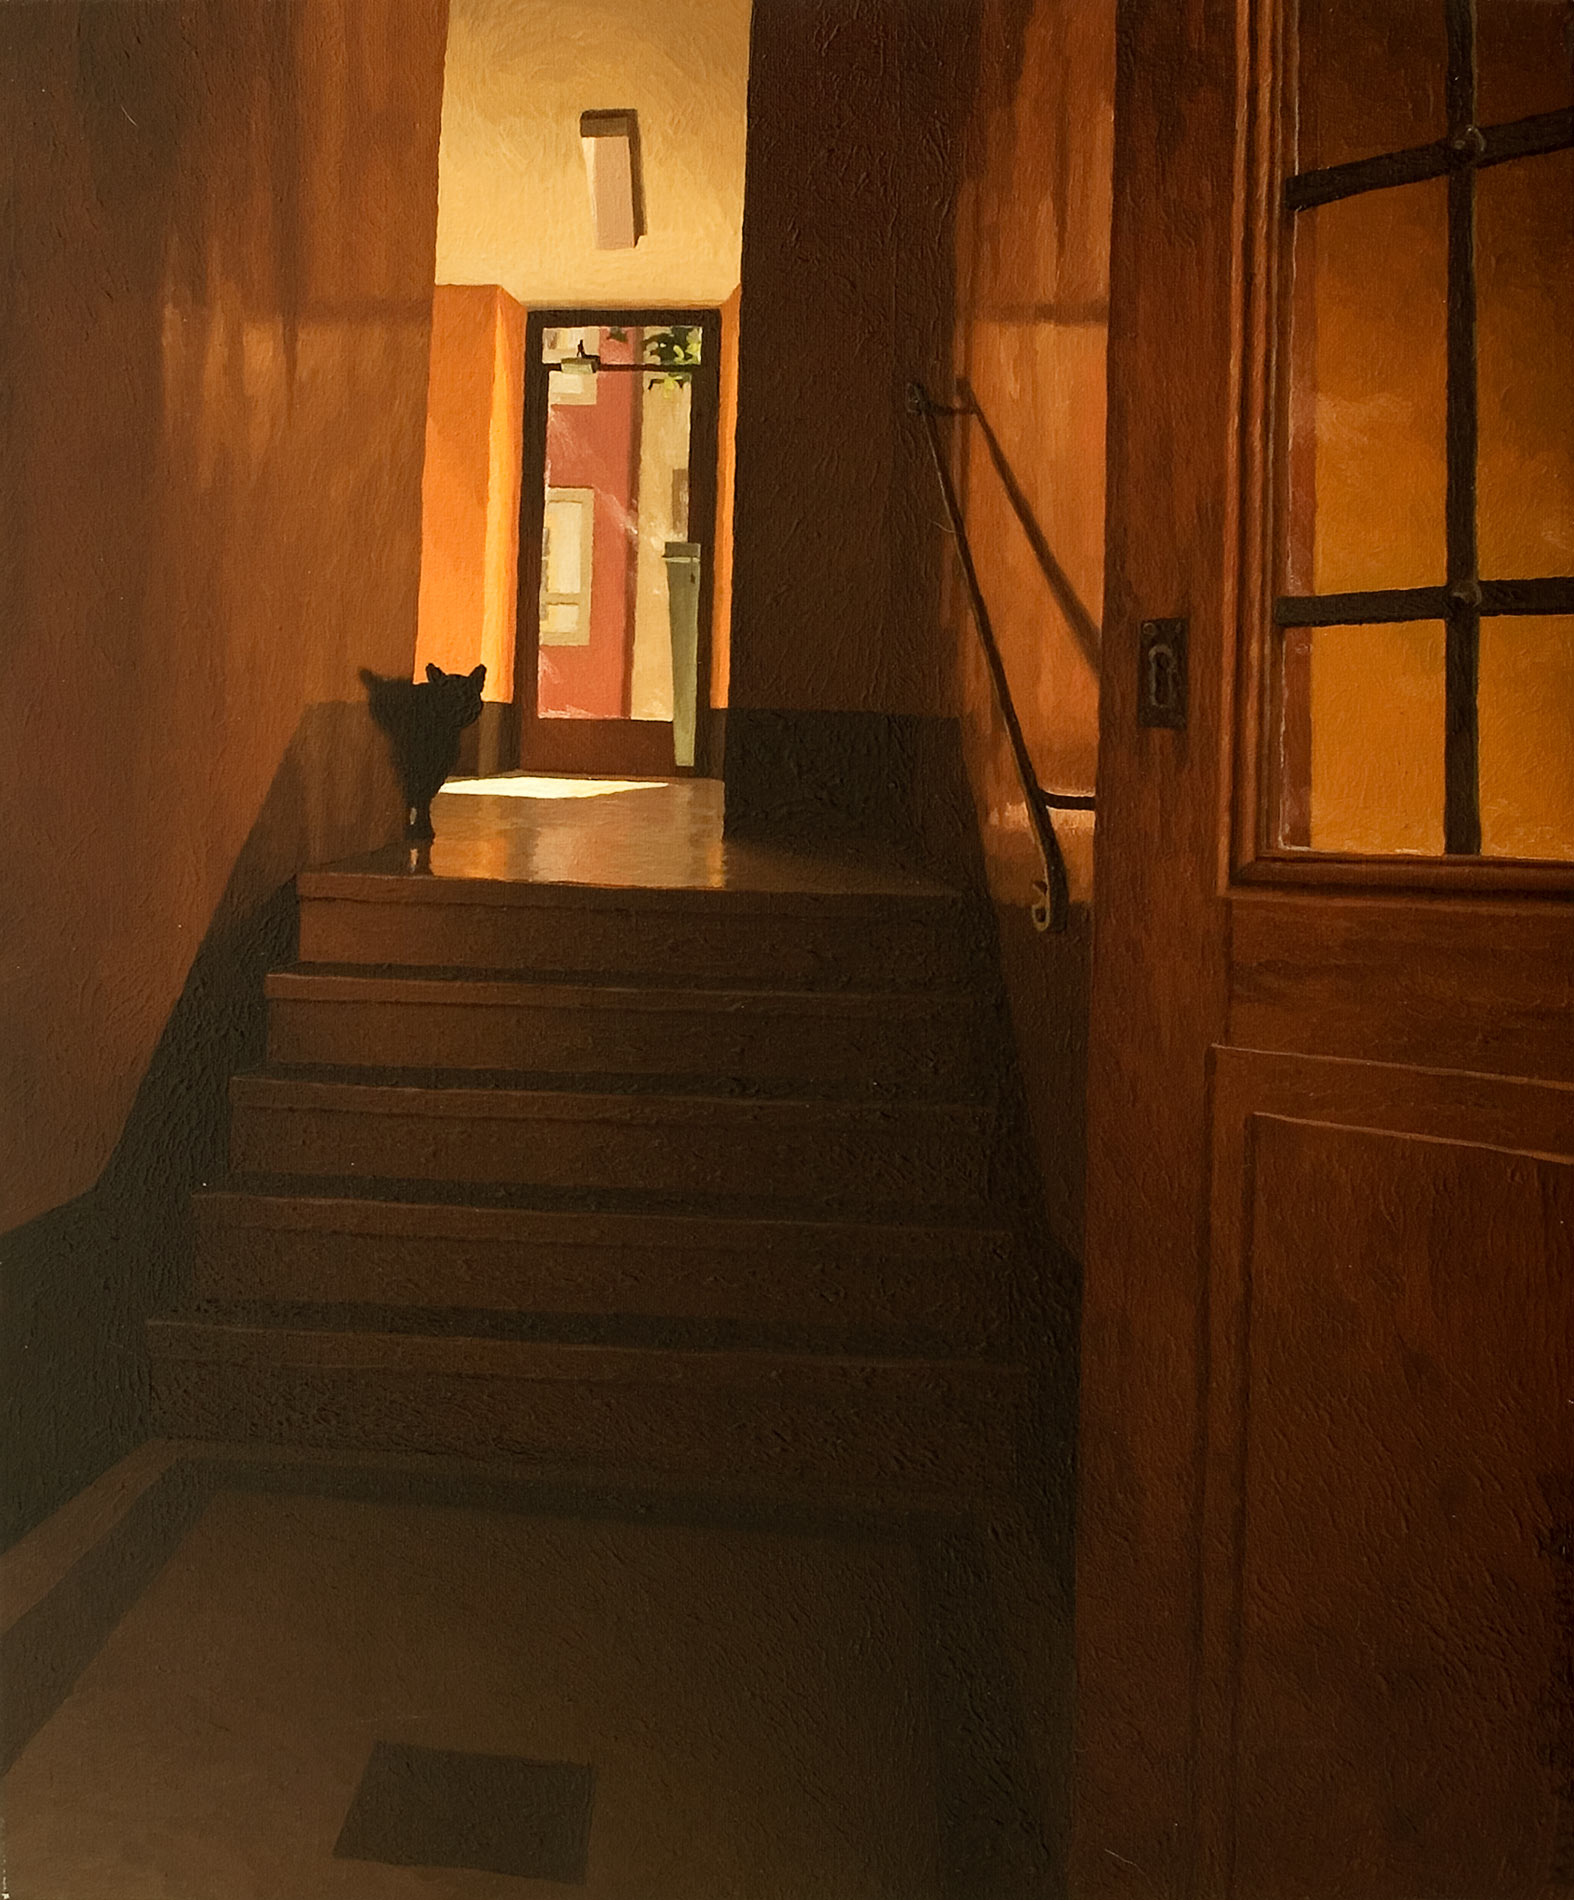 Hall d'immeuble avec chat